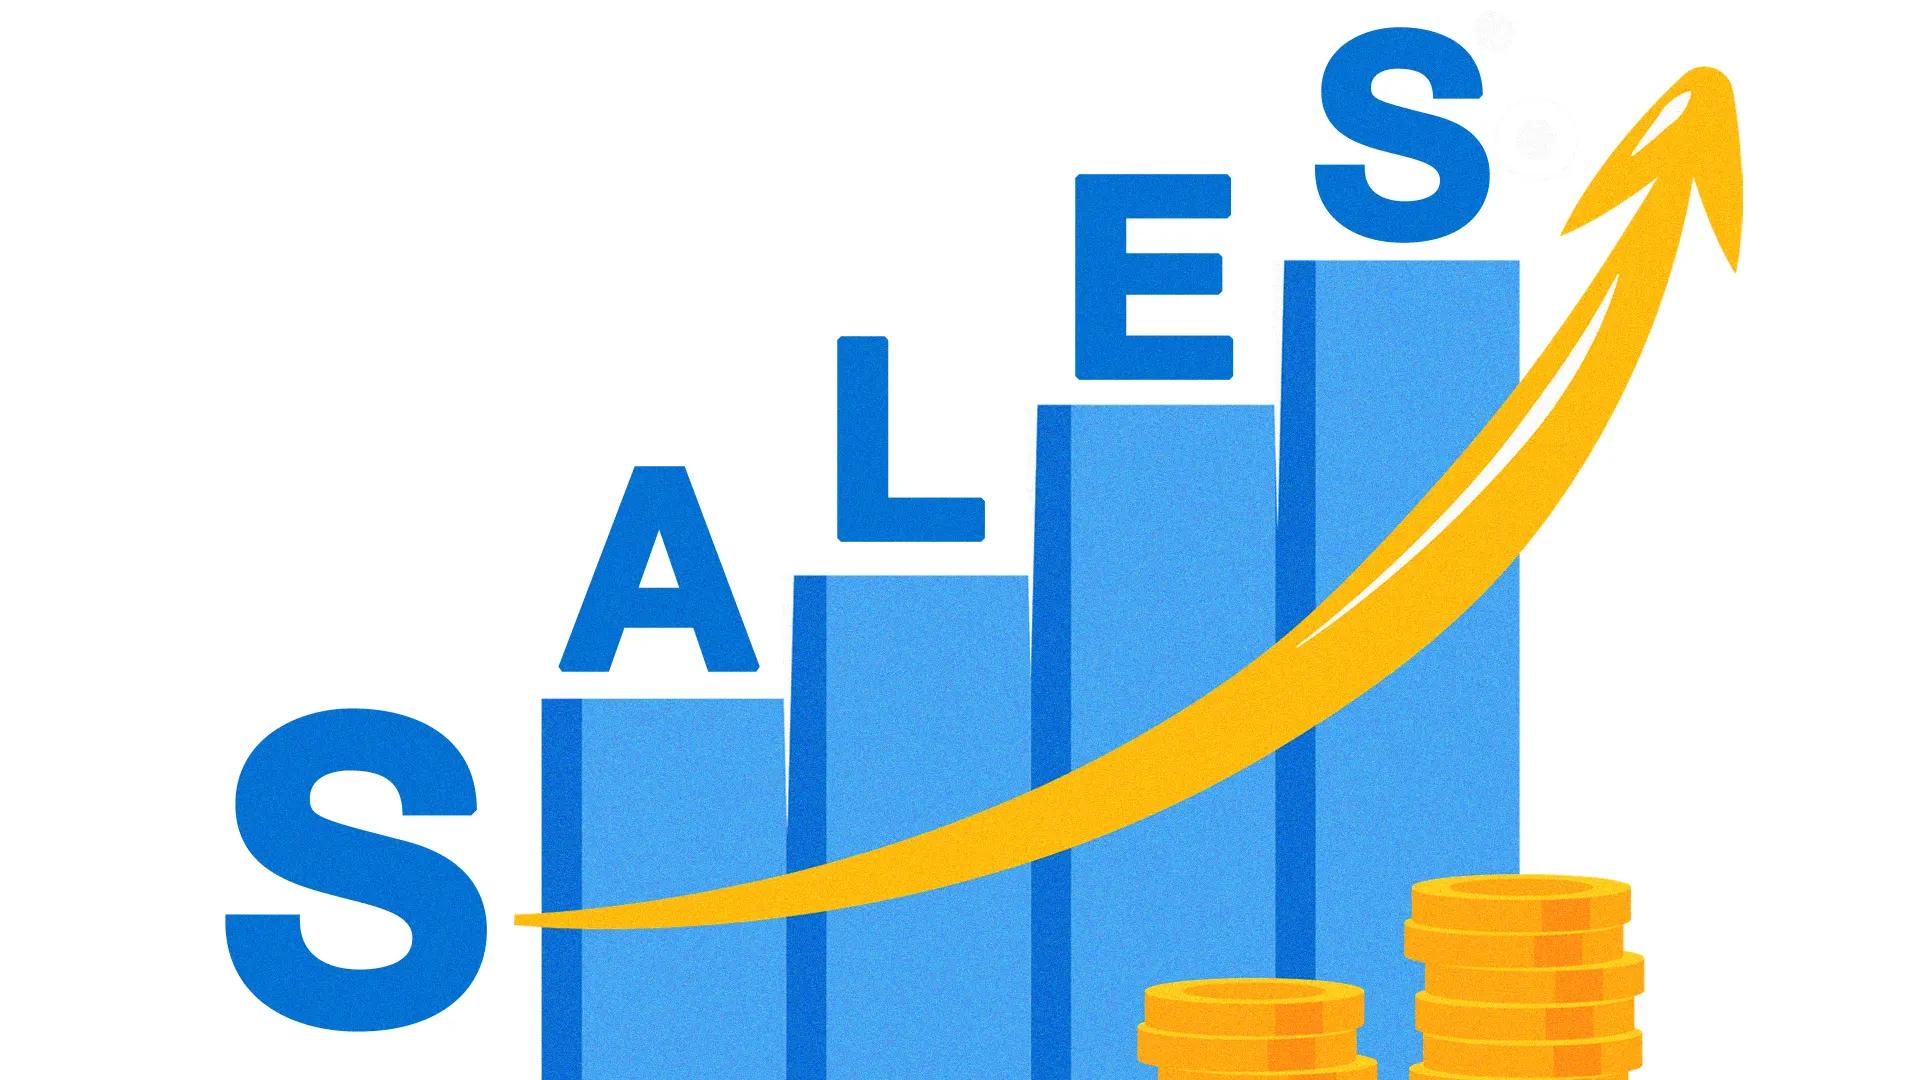 visual qr codes to increase sales